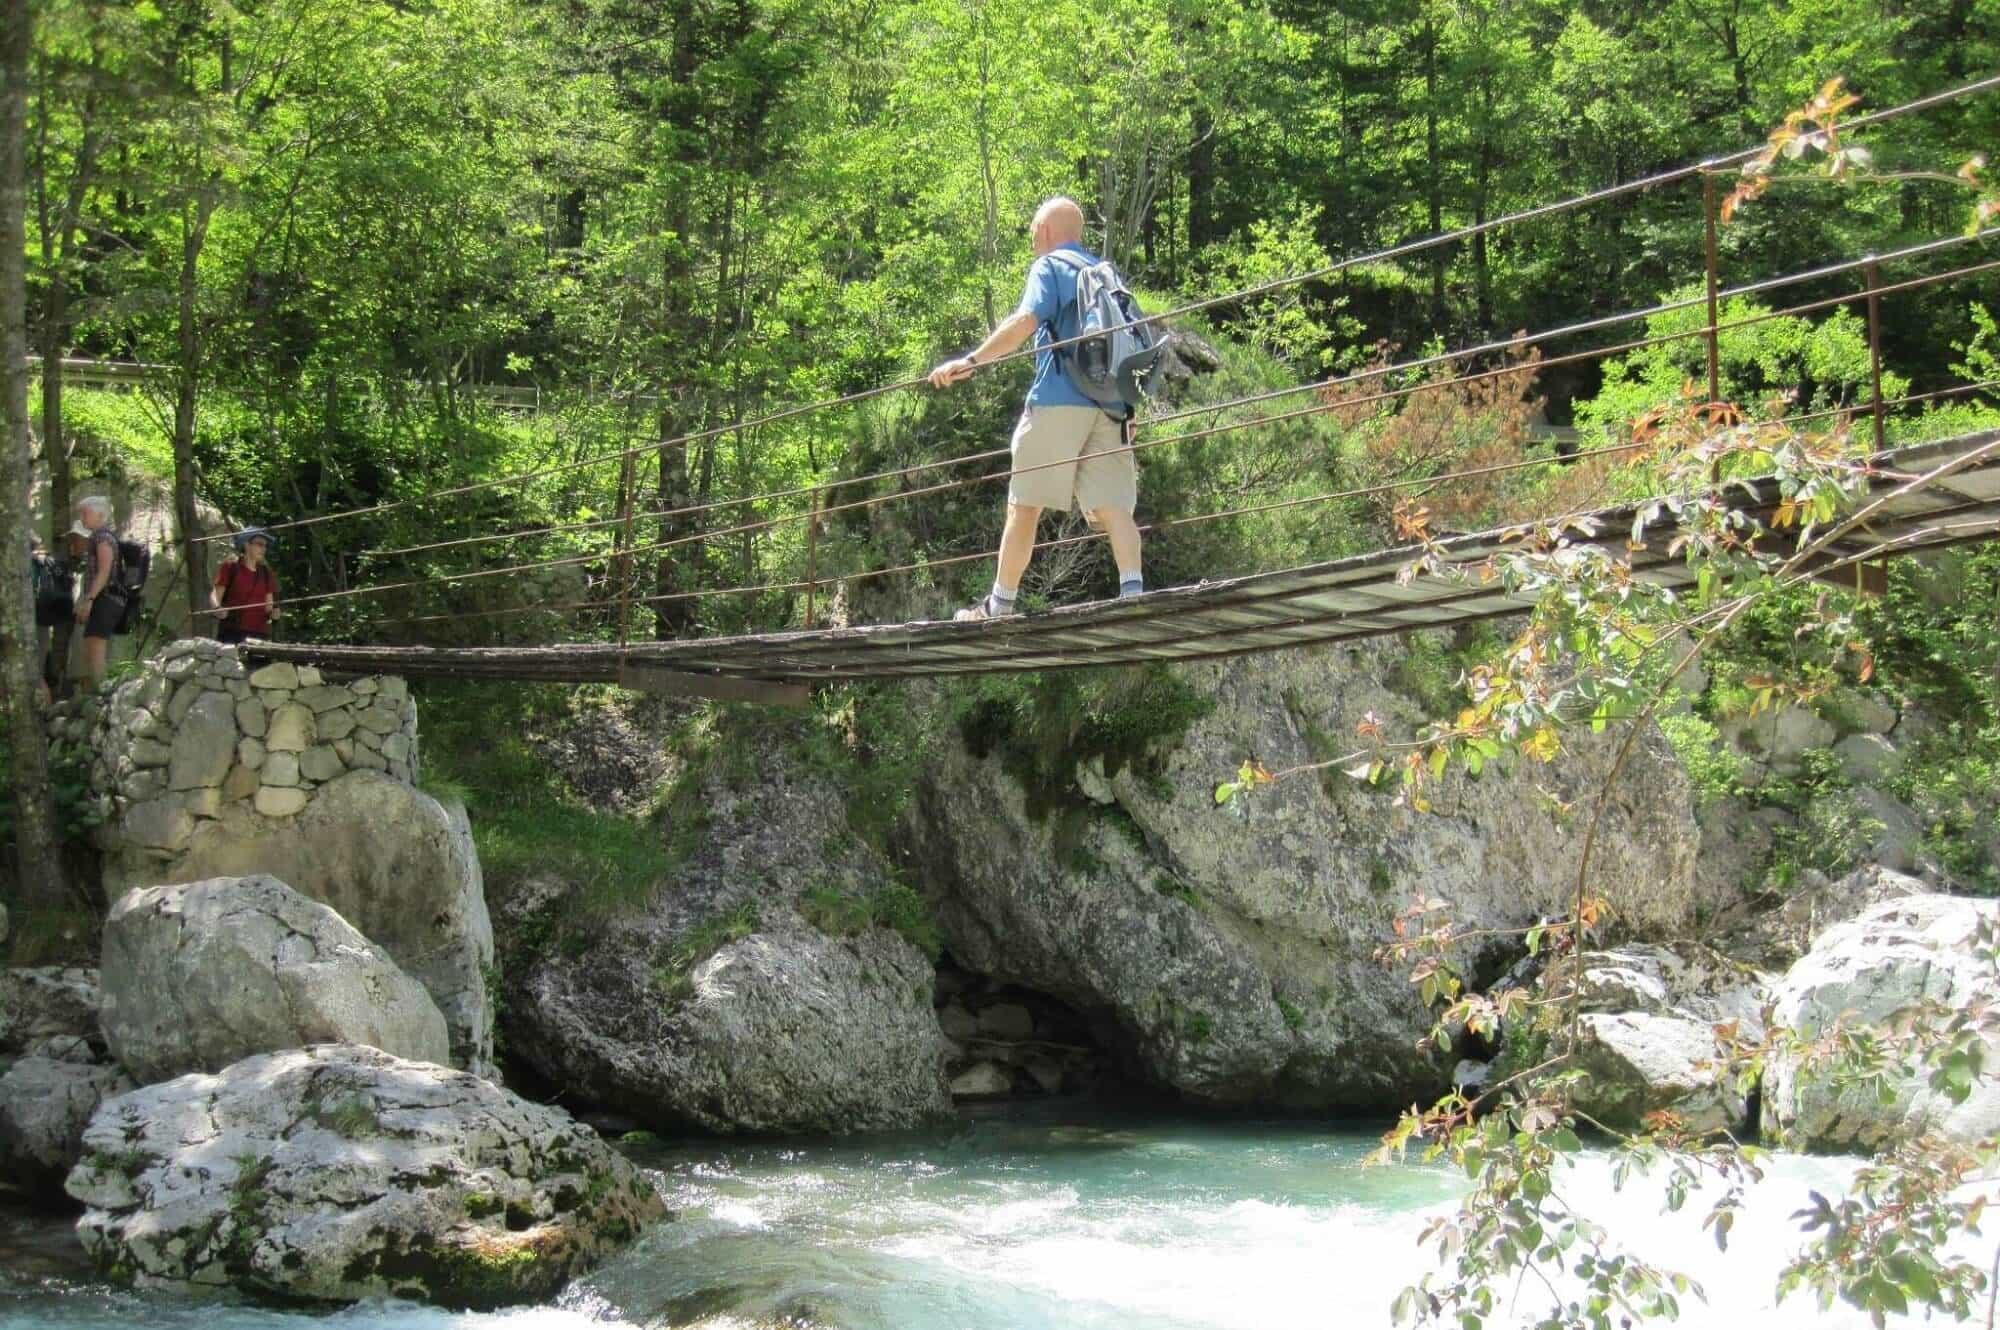 Crossing a rope bridge in Slovenia